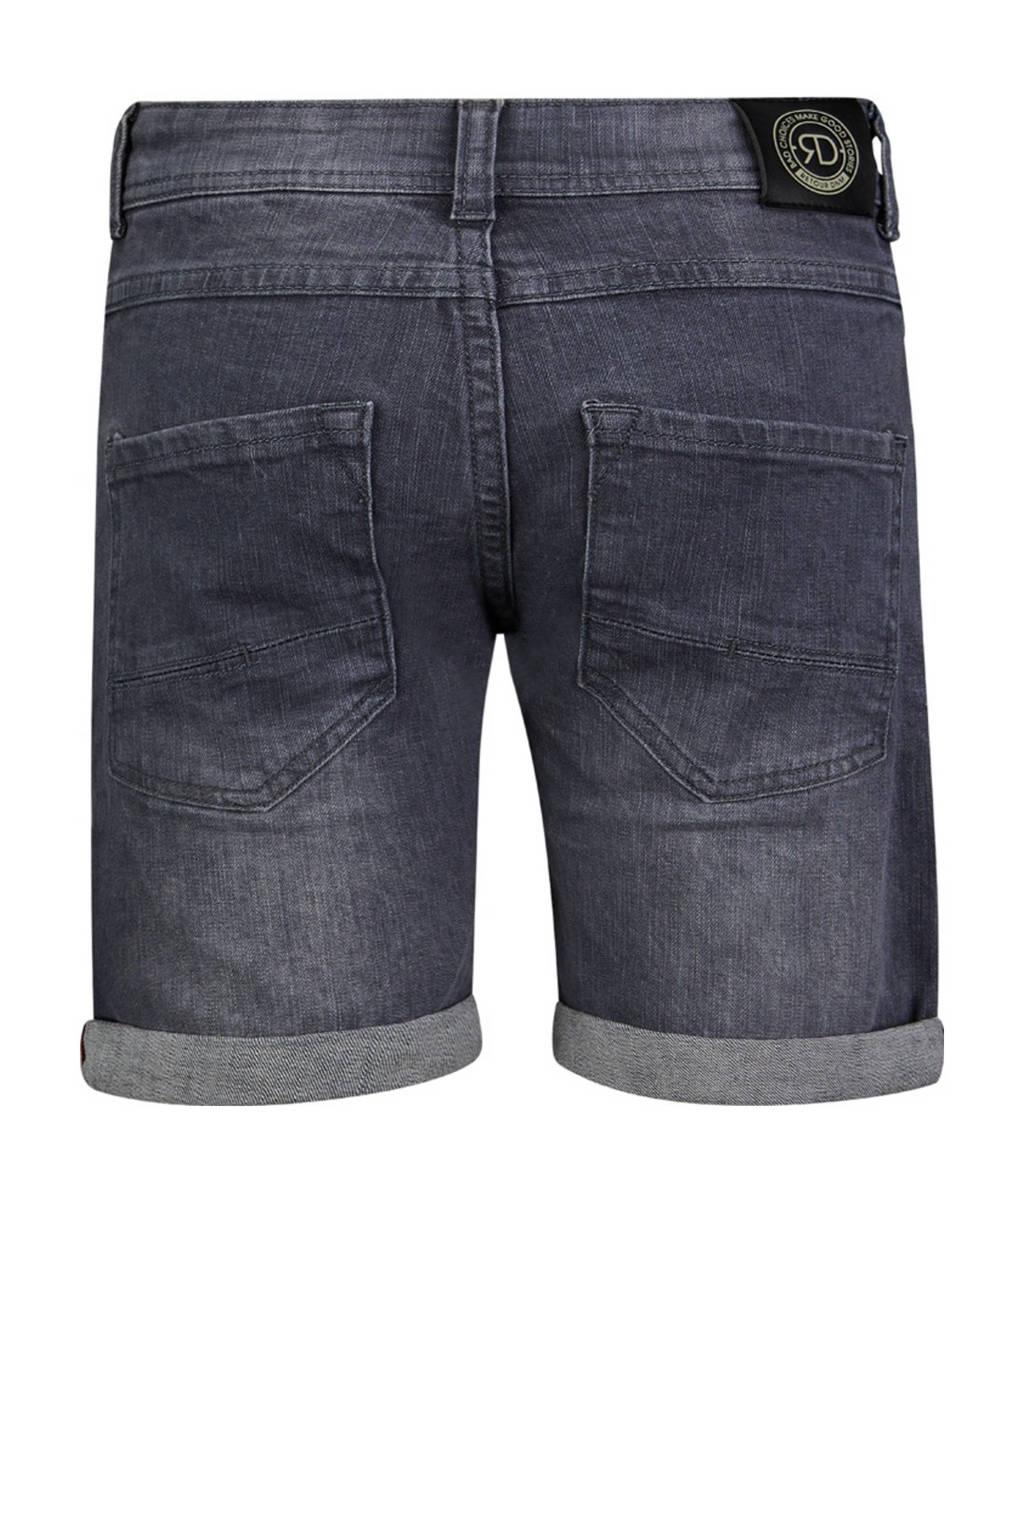 Retour Denim regular fit jeans bermuda Edmundo light grey denim, Light Grey Denim